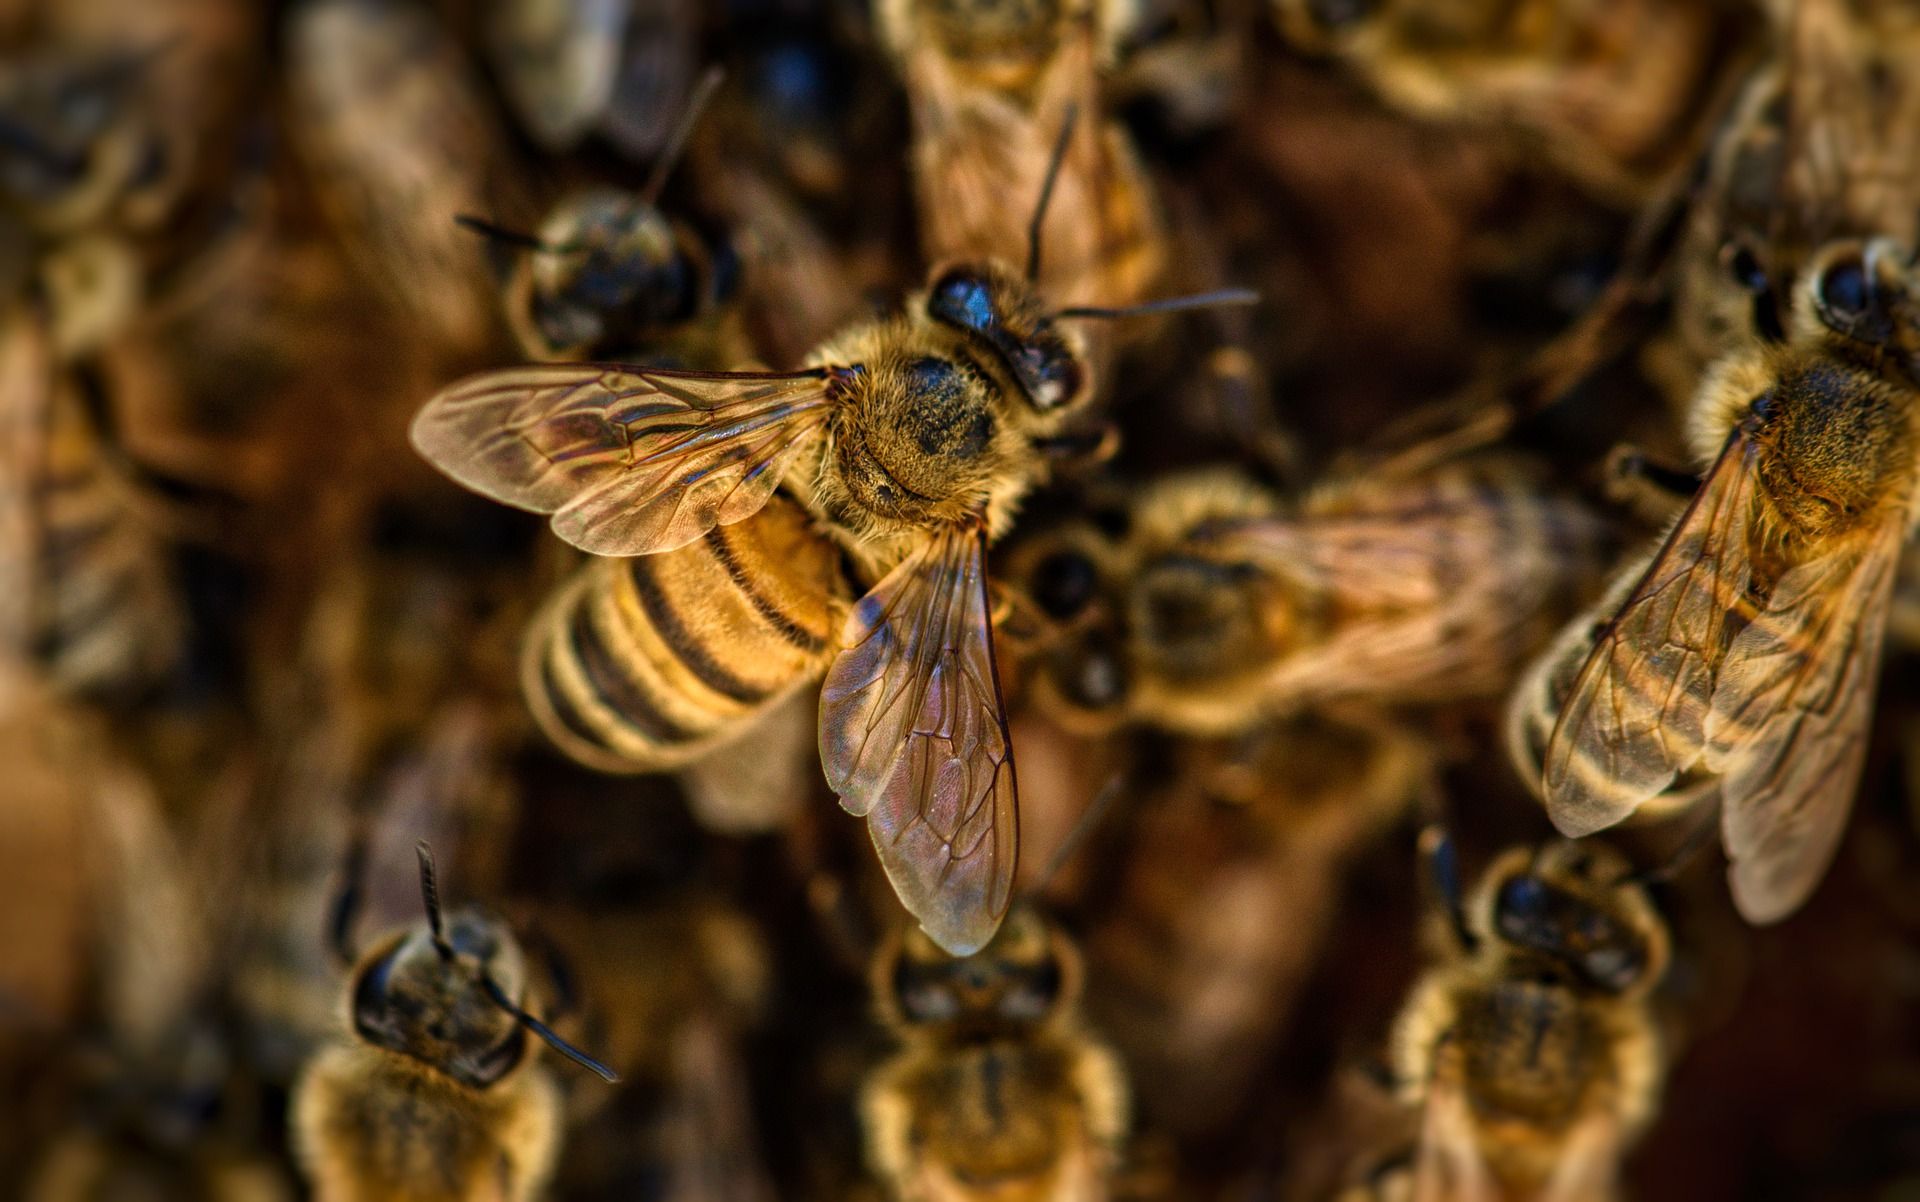 объединение пчел